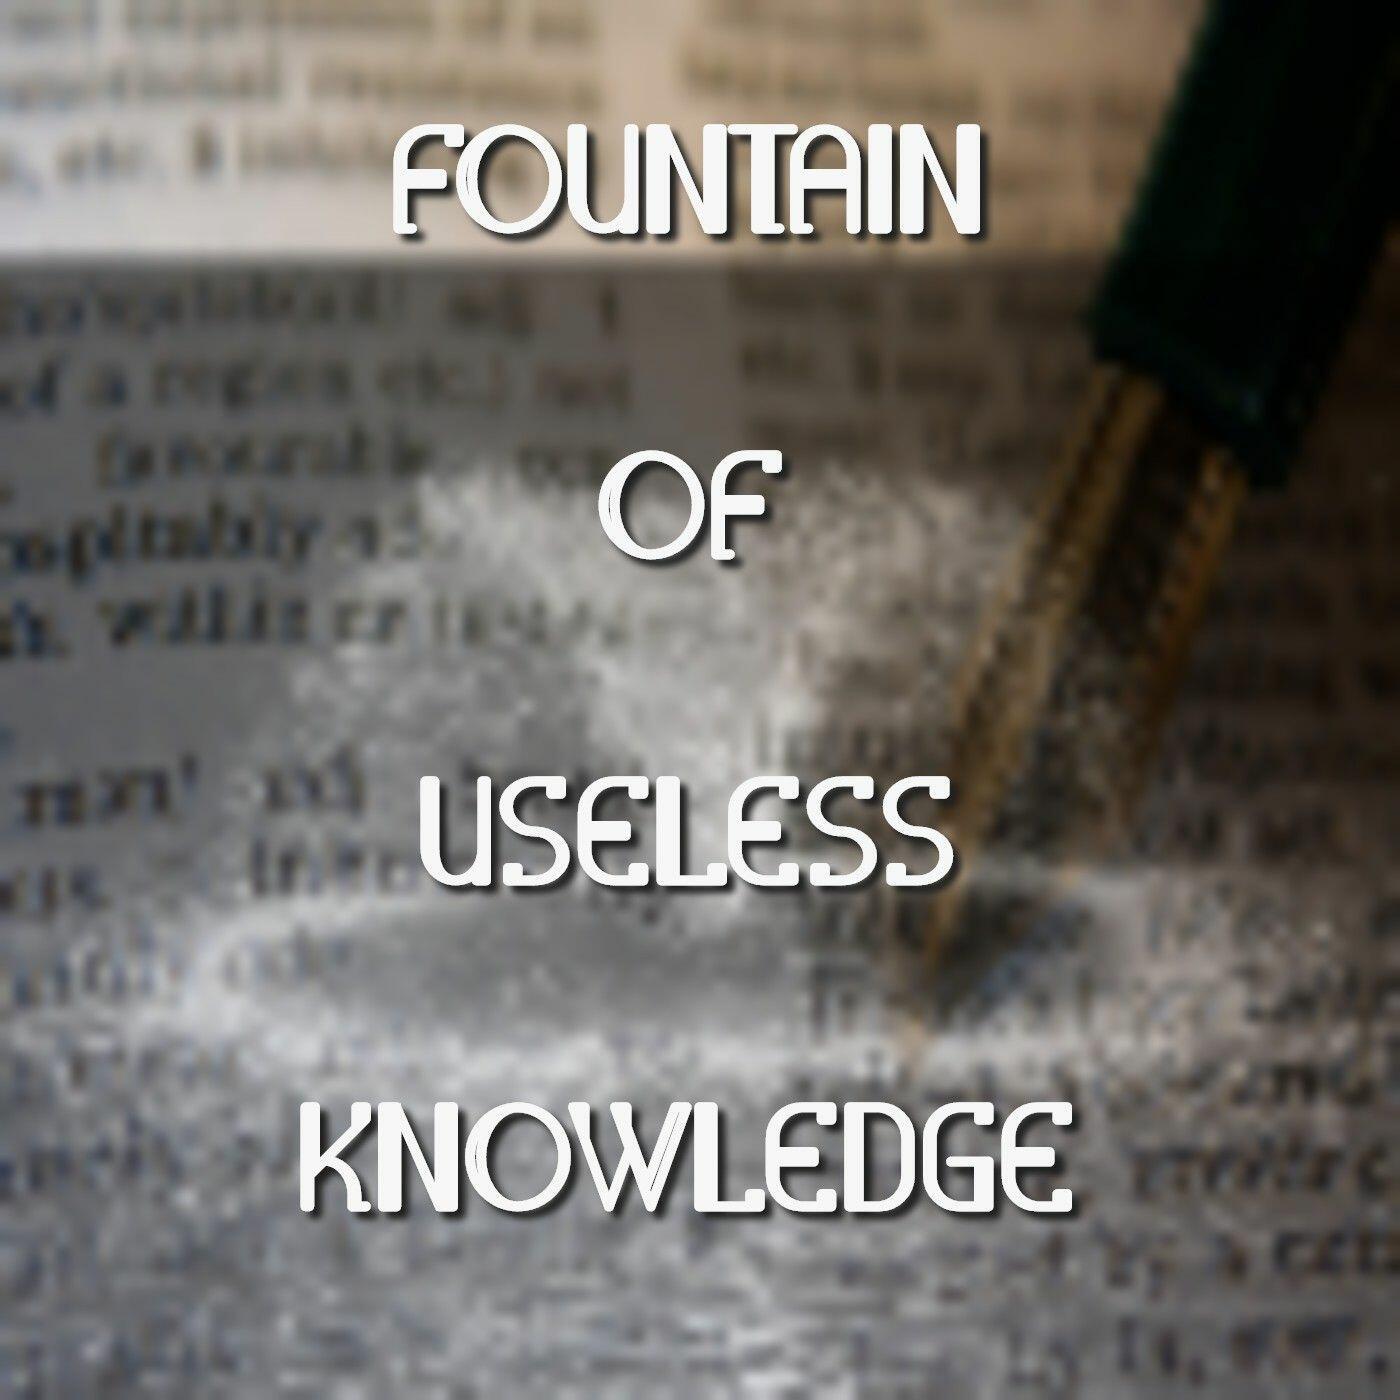 Fountain Of Useless Knowledge